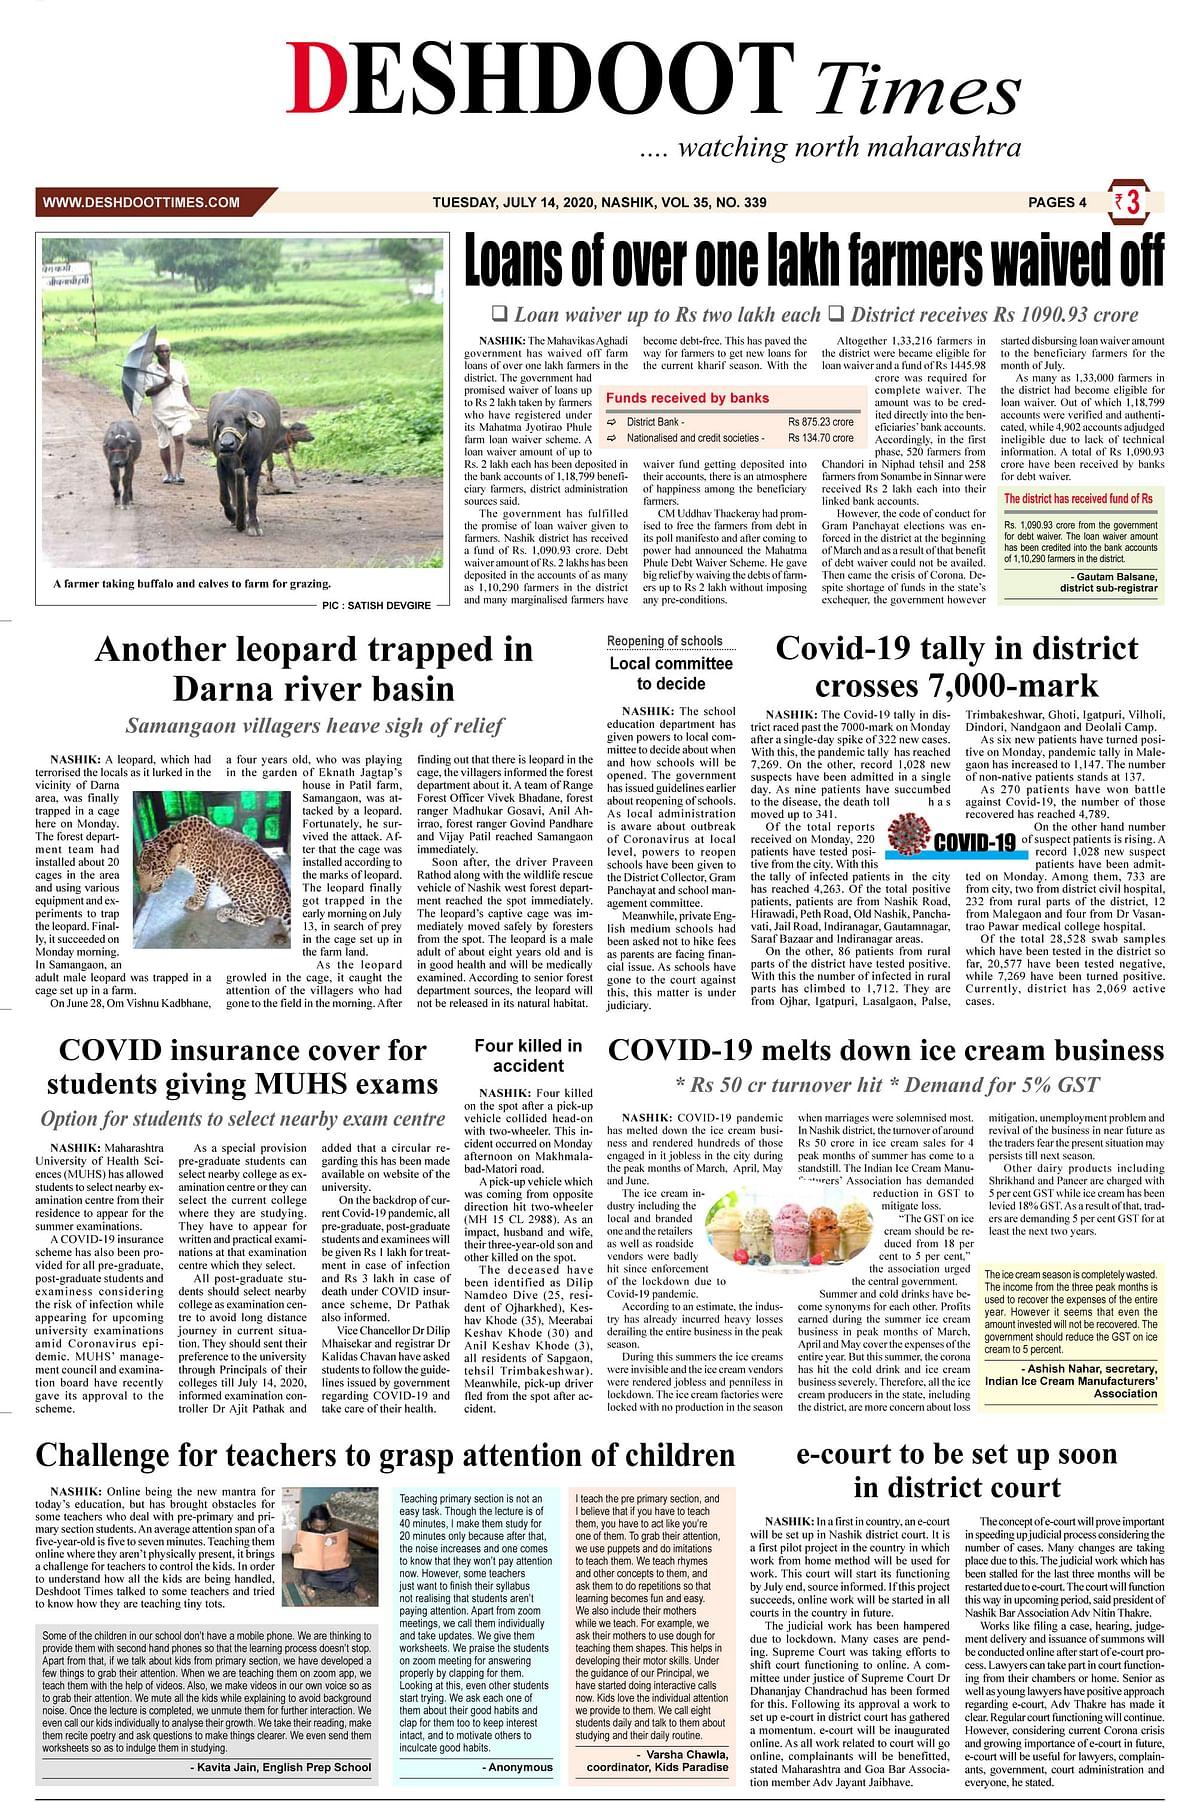 Deshdoot Times E Paper, 14 July 2020